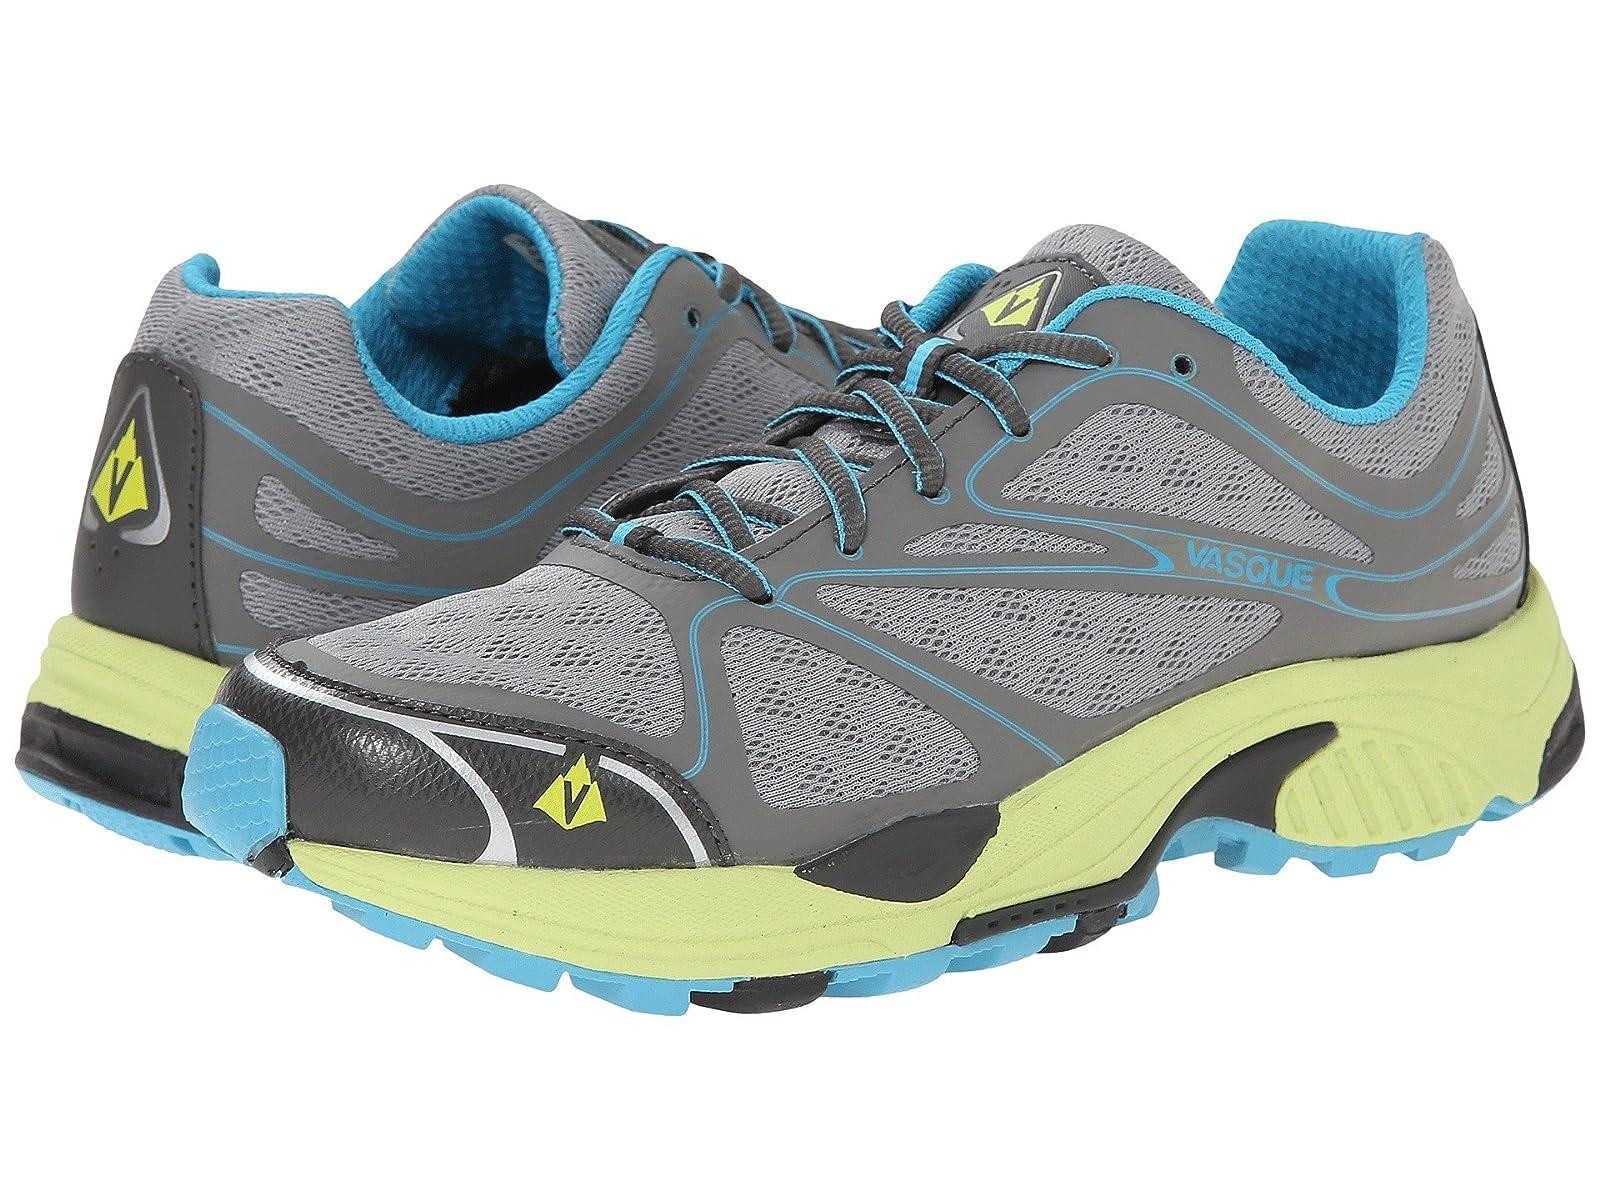 Vasque Pendulum IICheap and distinctive eye-catching shoes